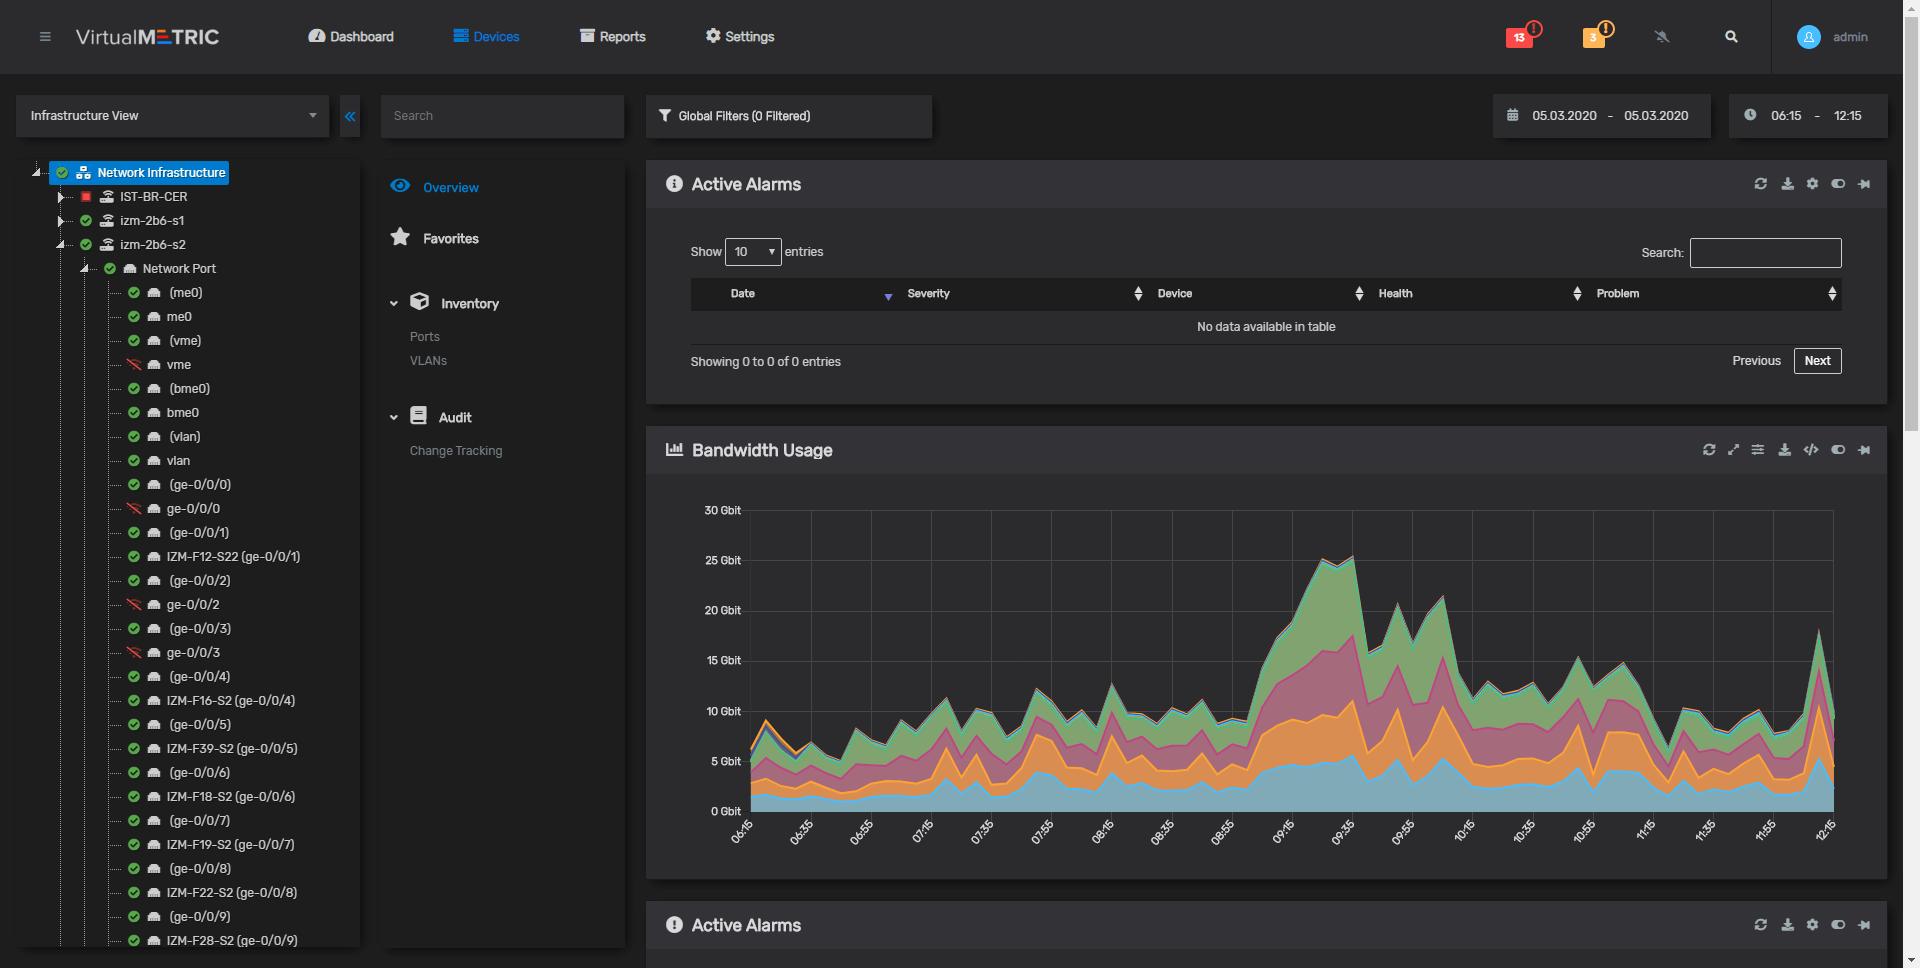 VirtualMetric Network Monitoring Dashboard